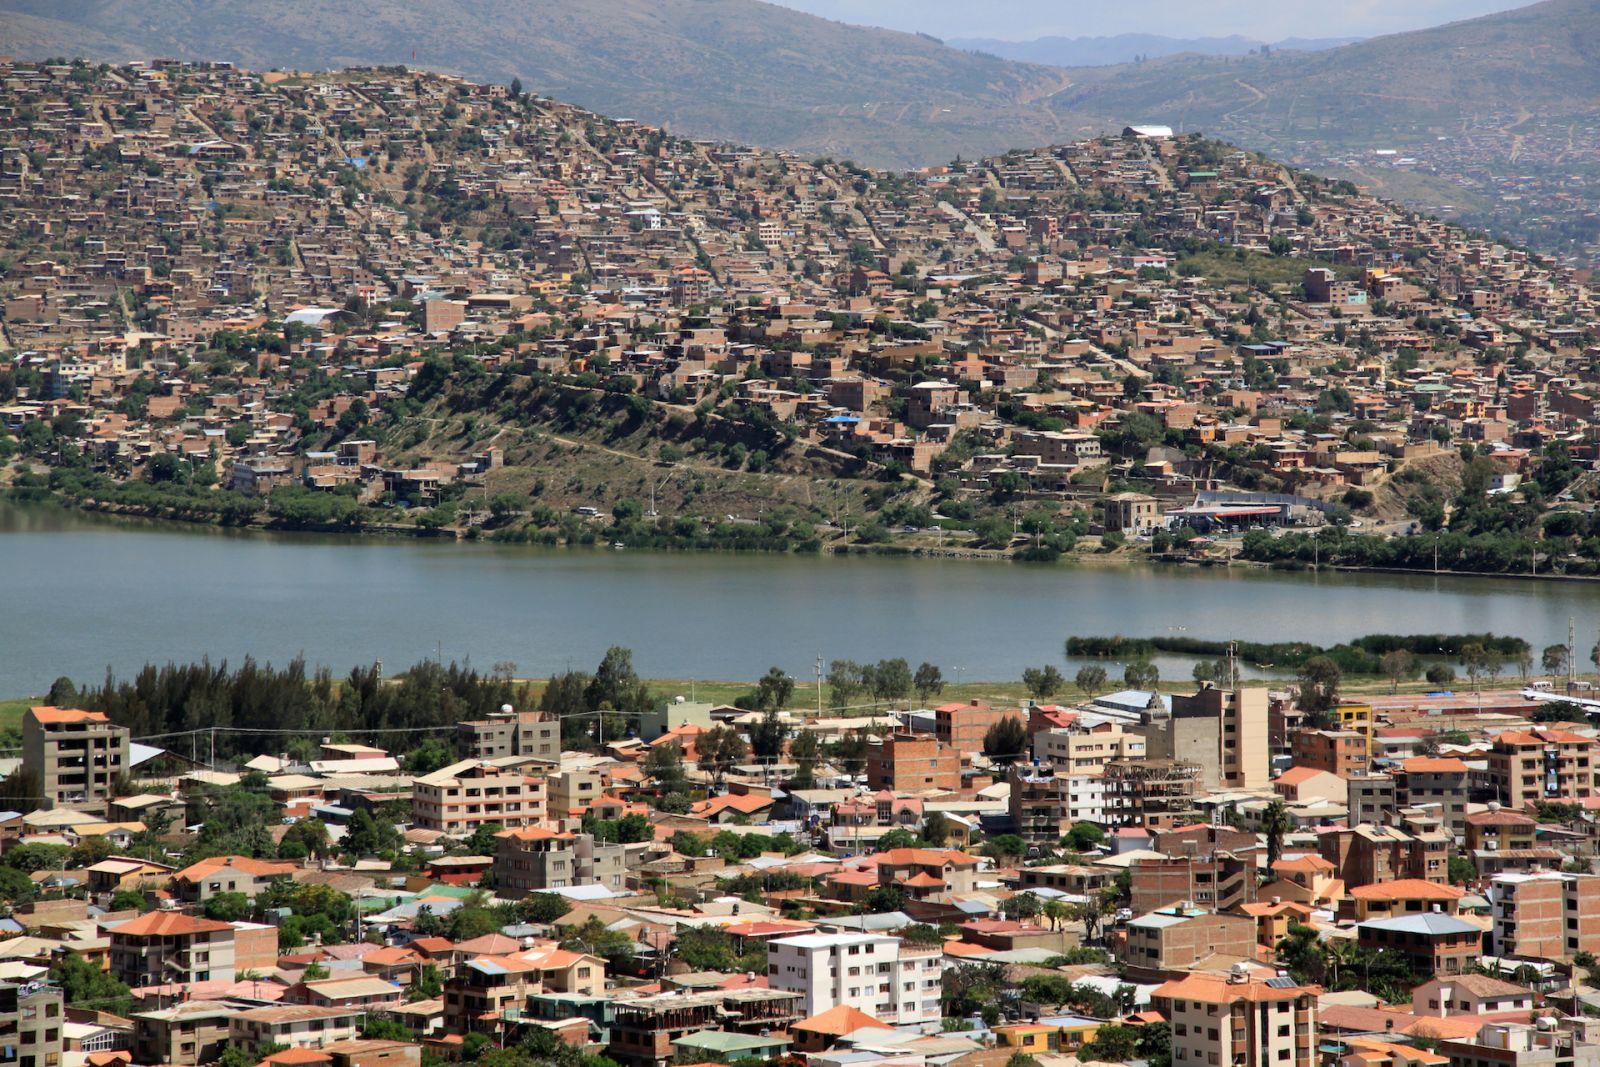 Fotos de casas en venta en cochabamba bolivia 100